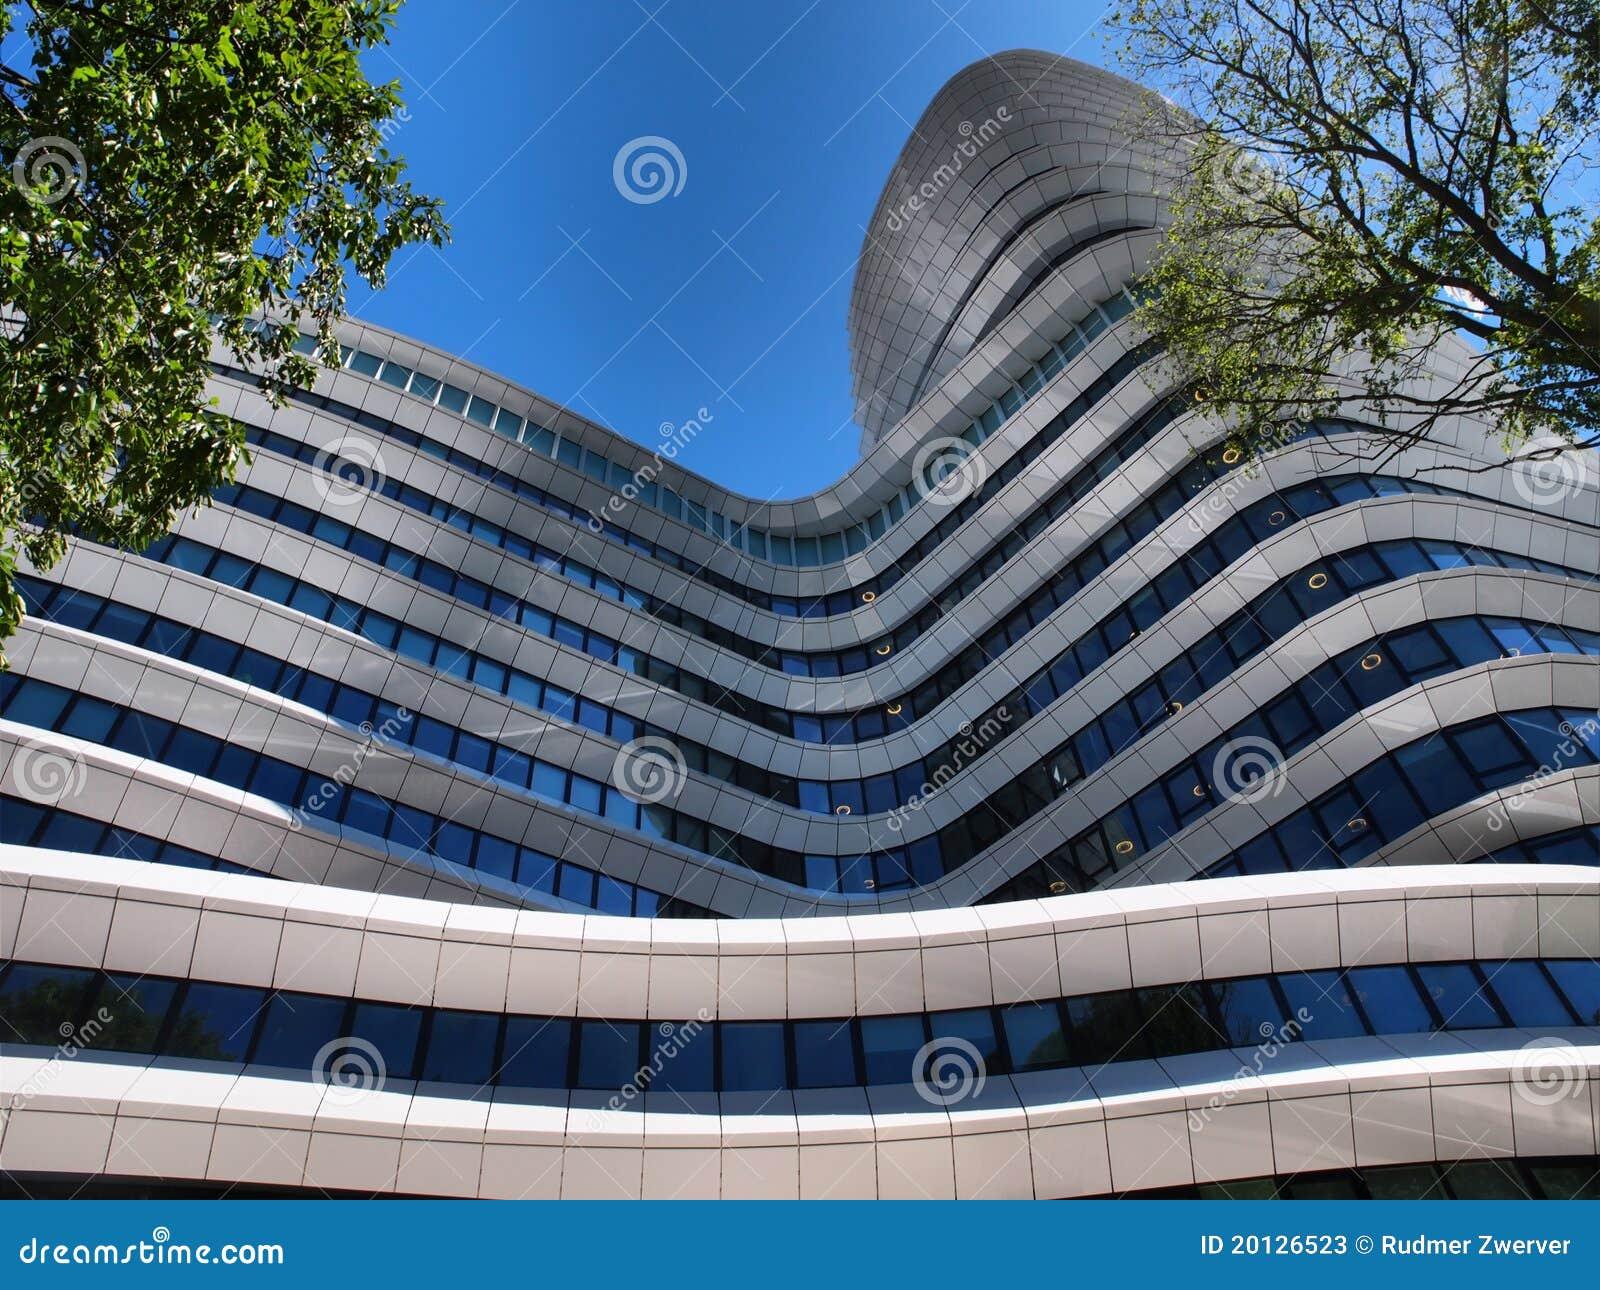 Immeuble de bureaux moderne photos stock image 20126523 for Image immeuble moderne